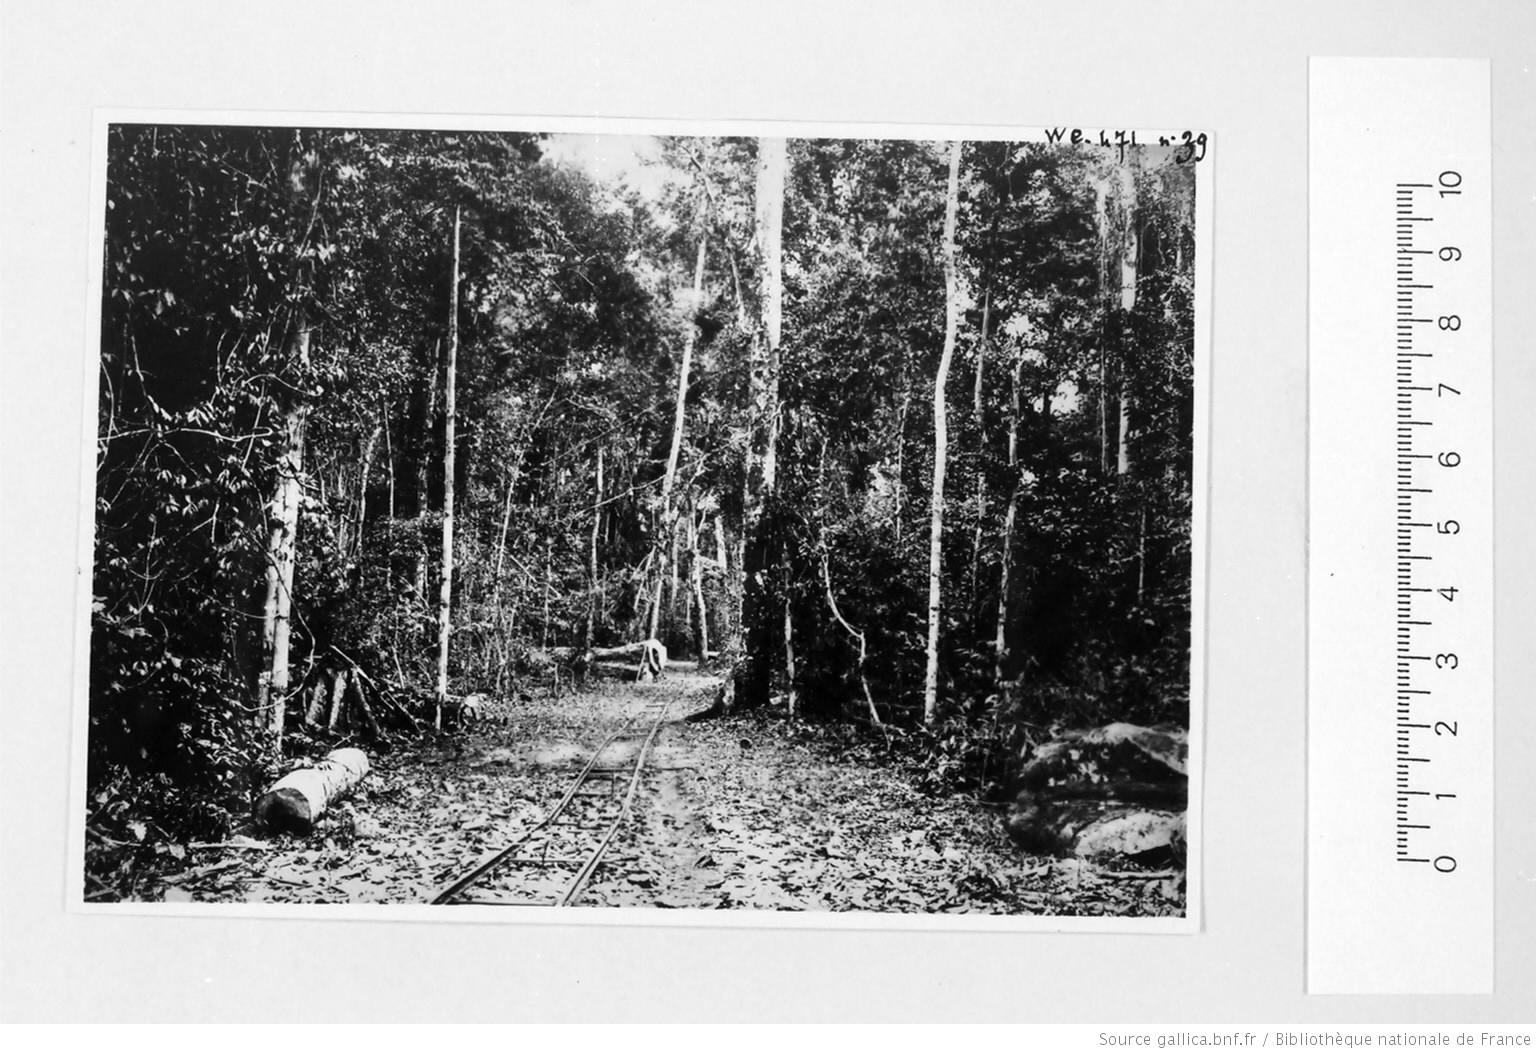 [39 phot. d'A.E.F. en 1924. Enregistré en 1936] - 37